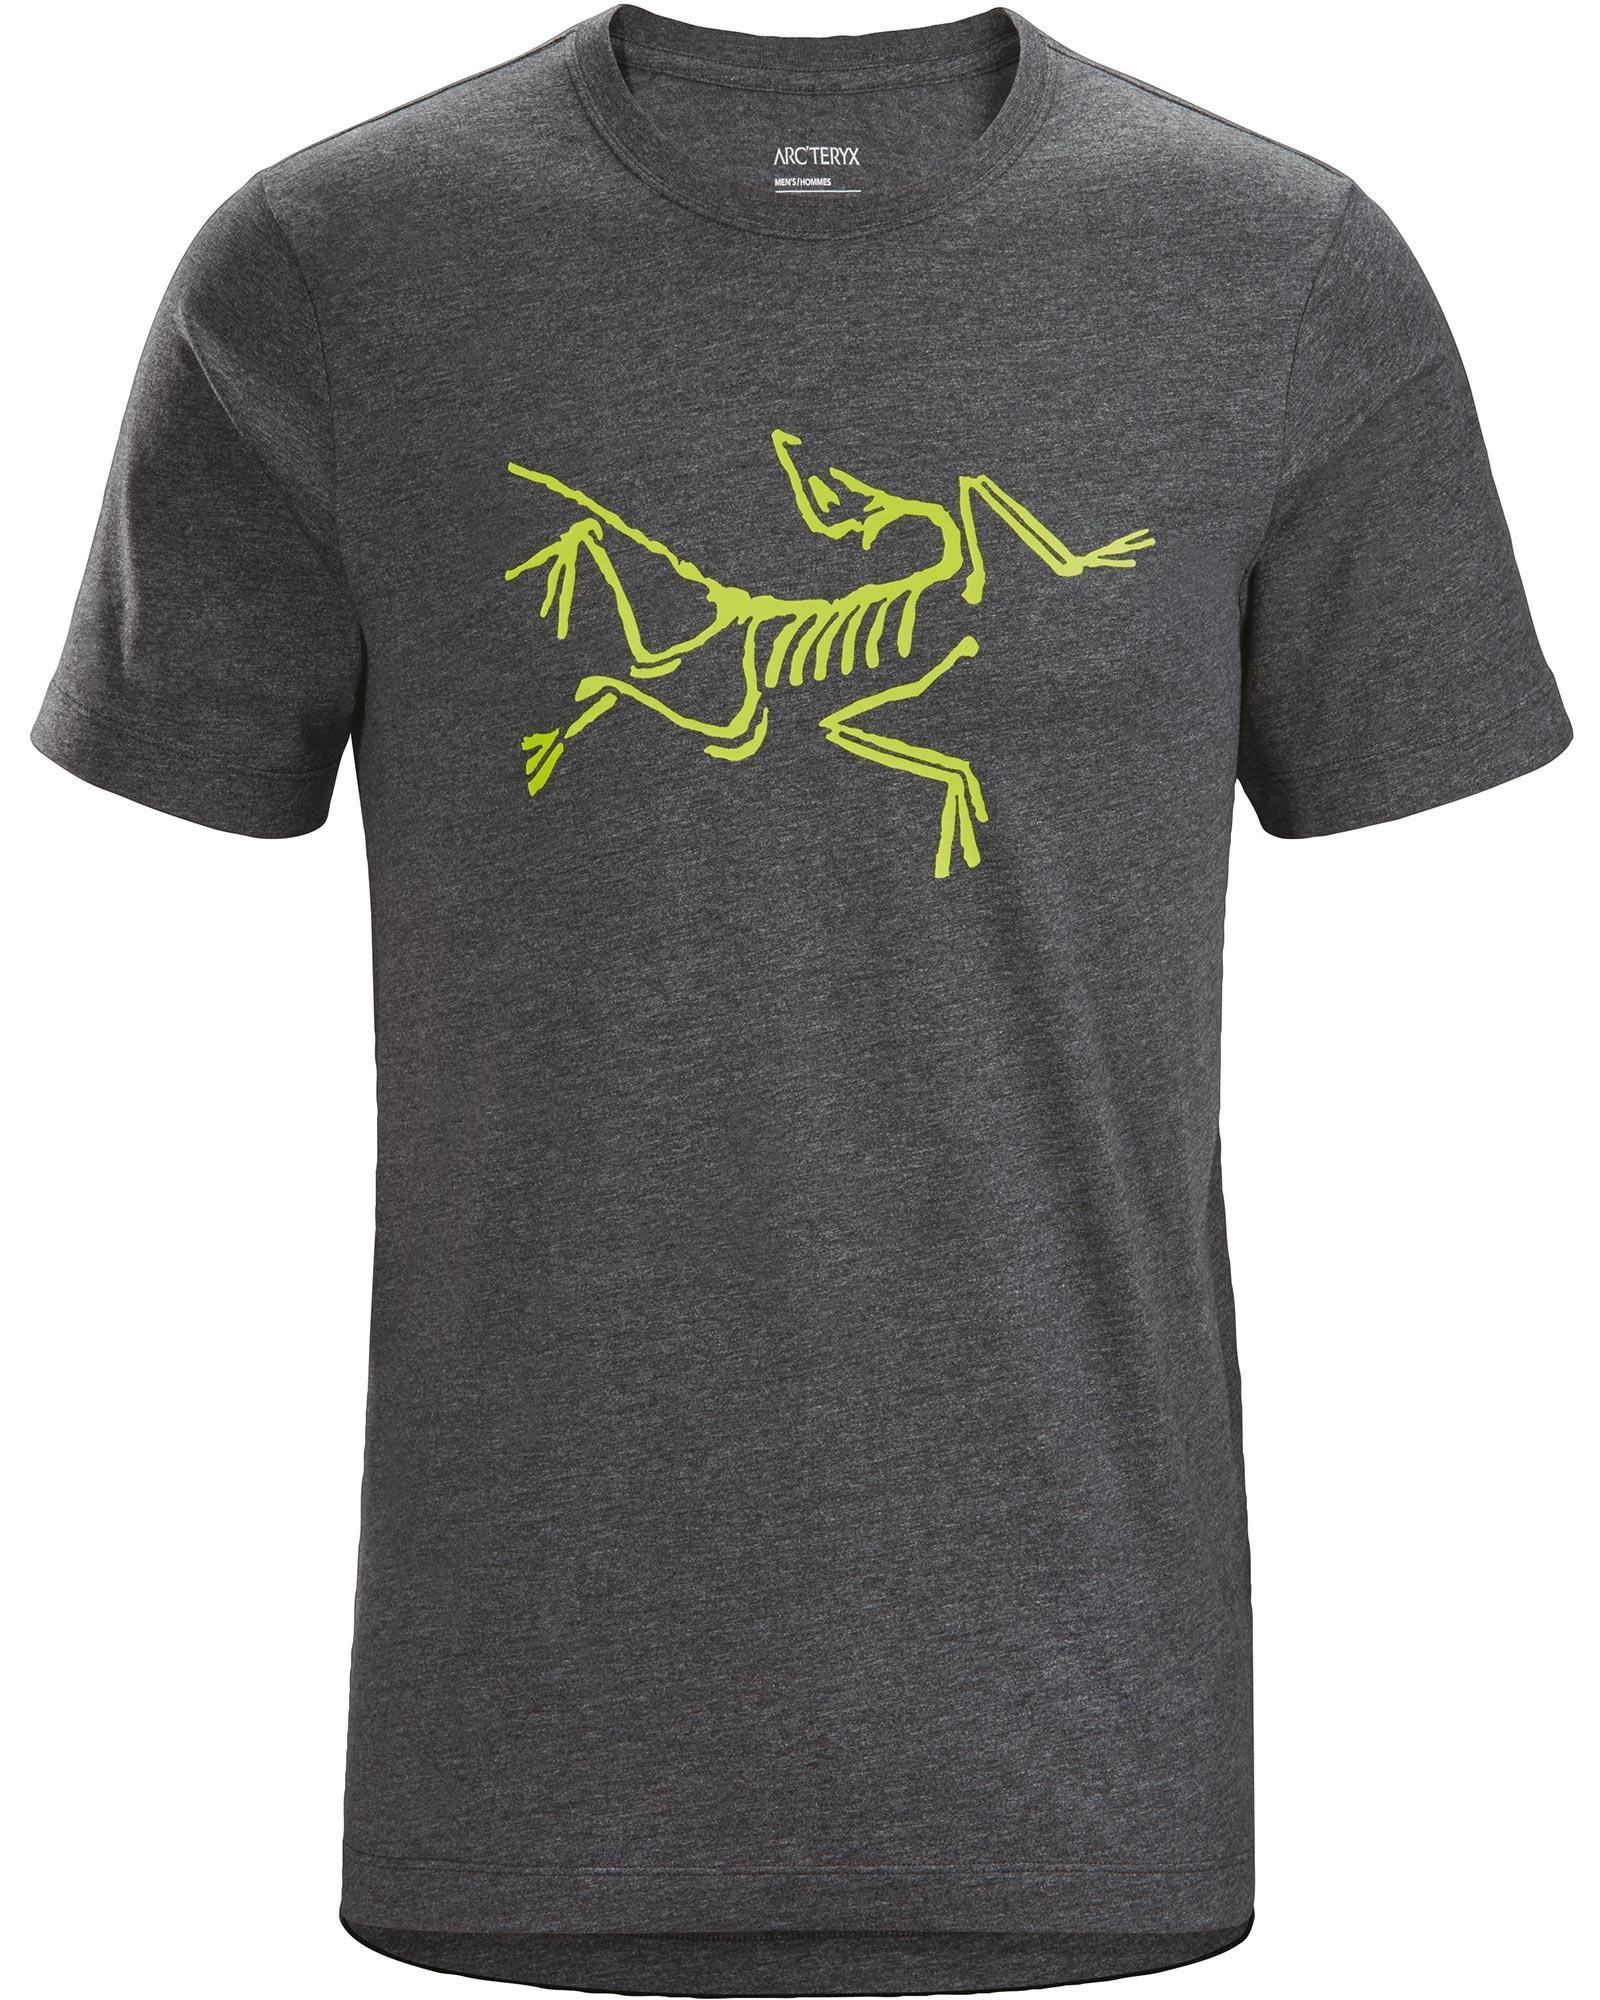 Arc'teryx Men's Archaeopteryx Short Sleeve T-Shirt 0